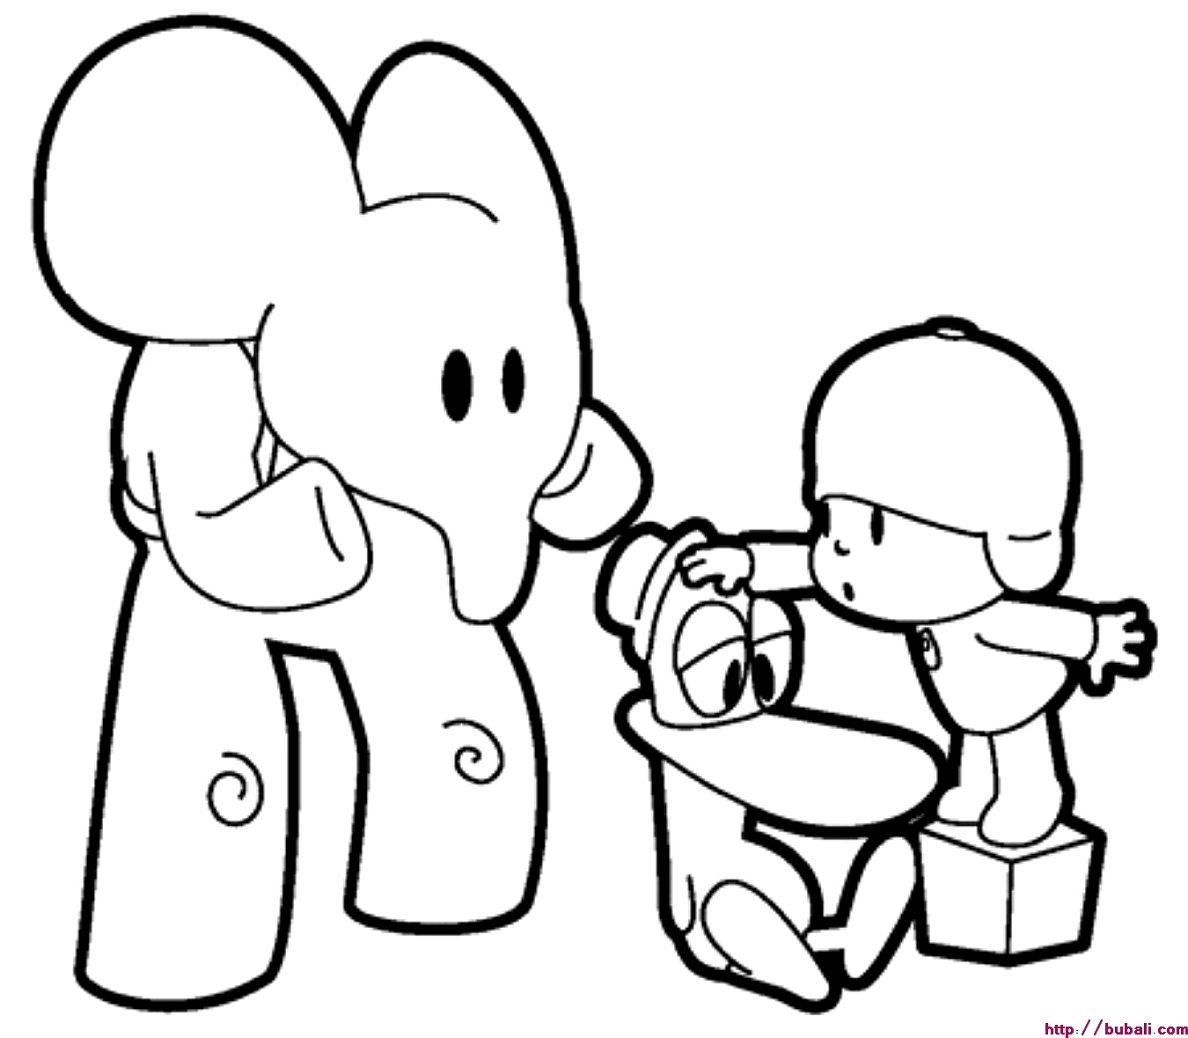 Dibujos para colorear - Dibujos para pintar camisetas infantiles ...